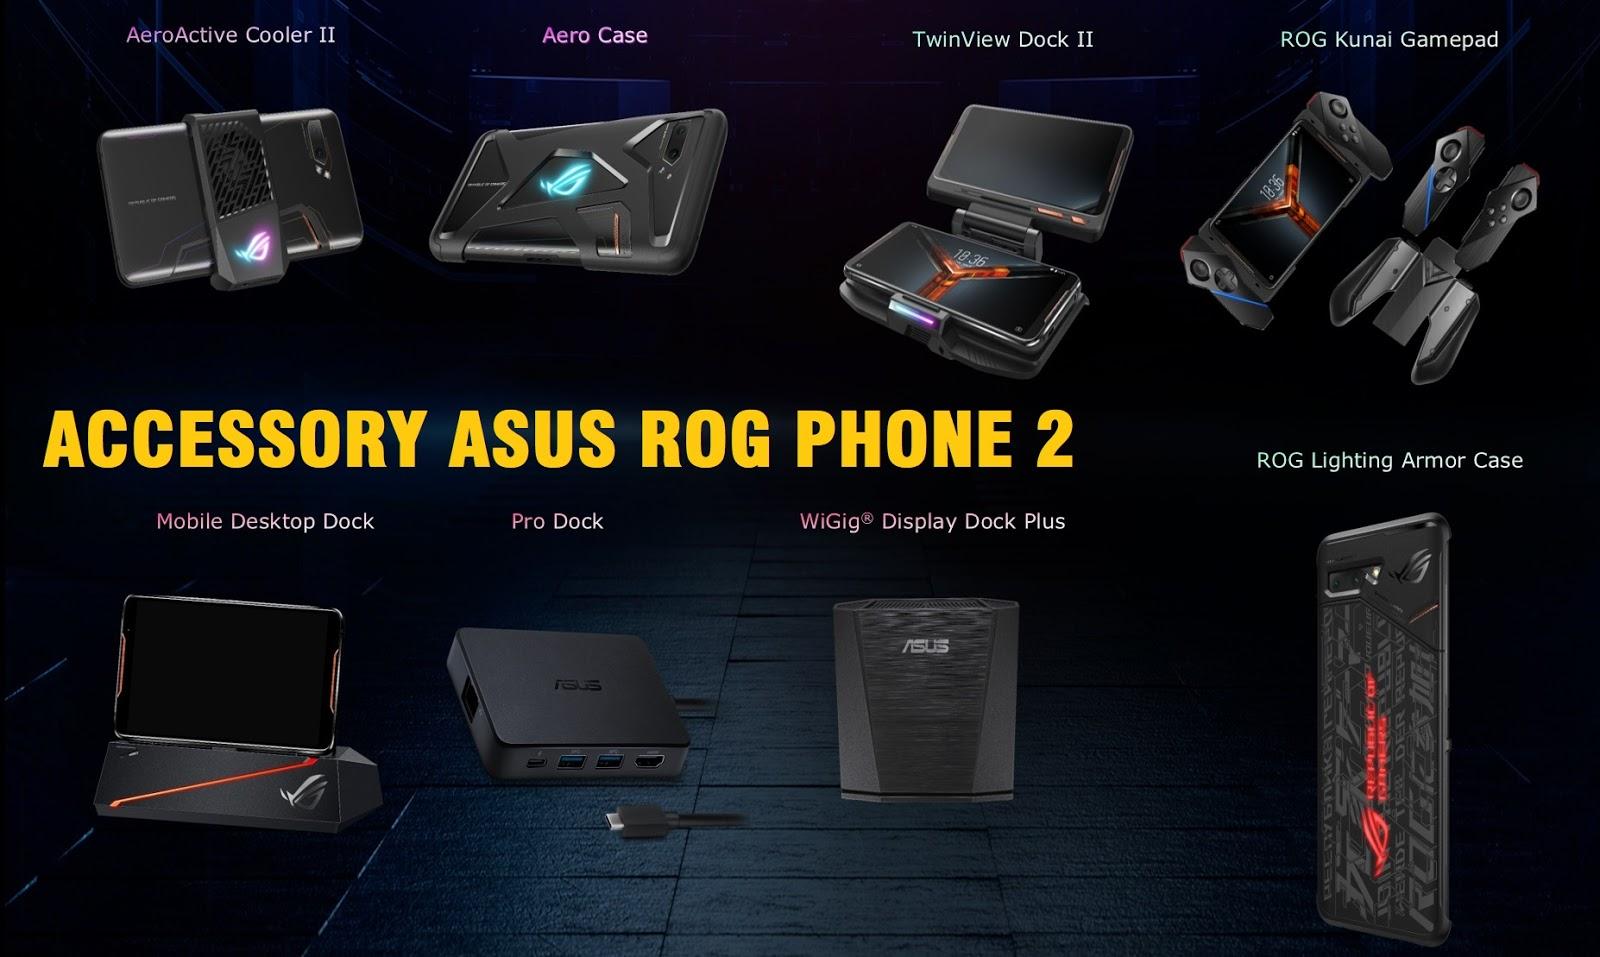 accessory asus rog phone 2